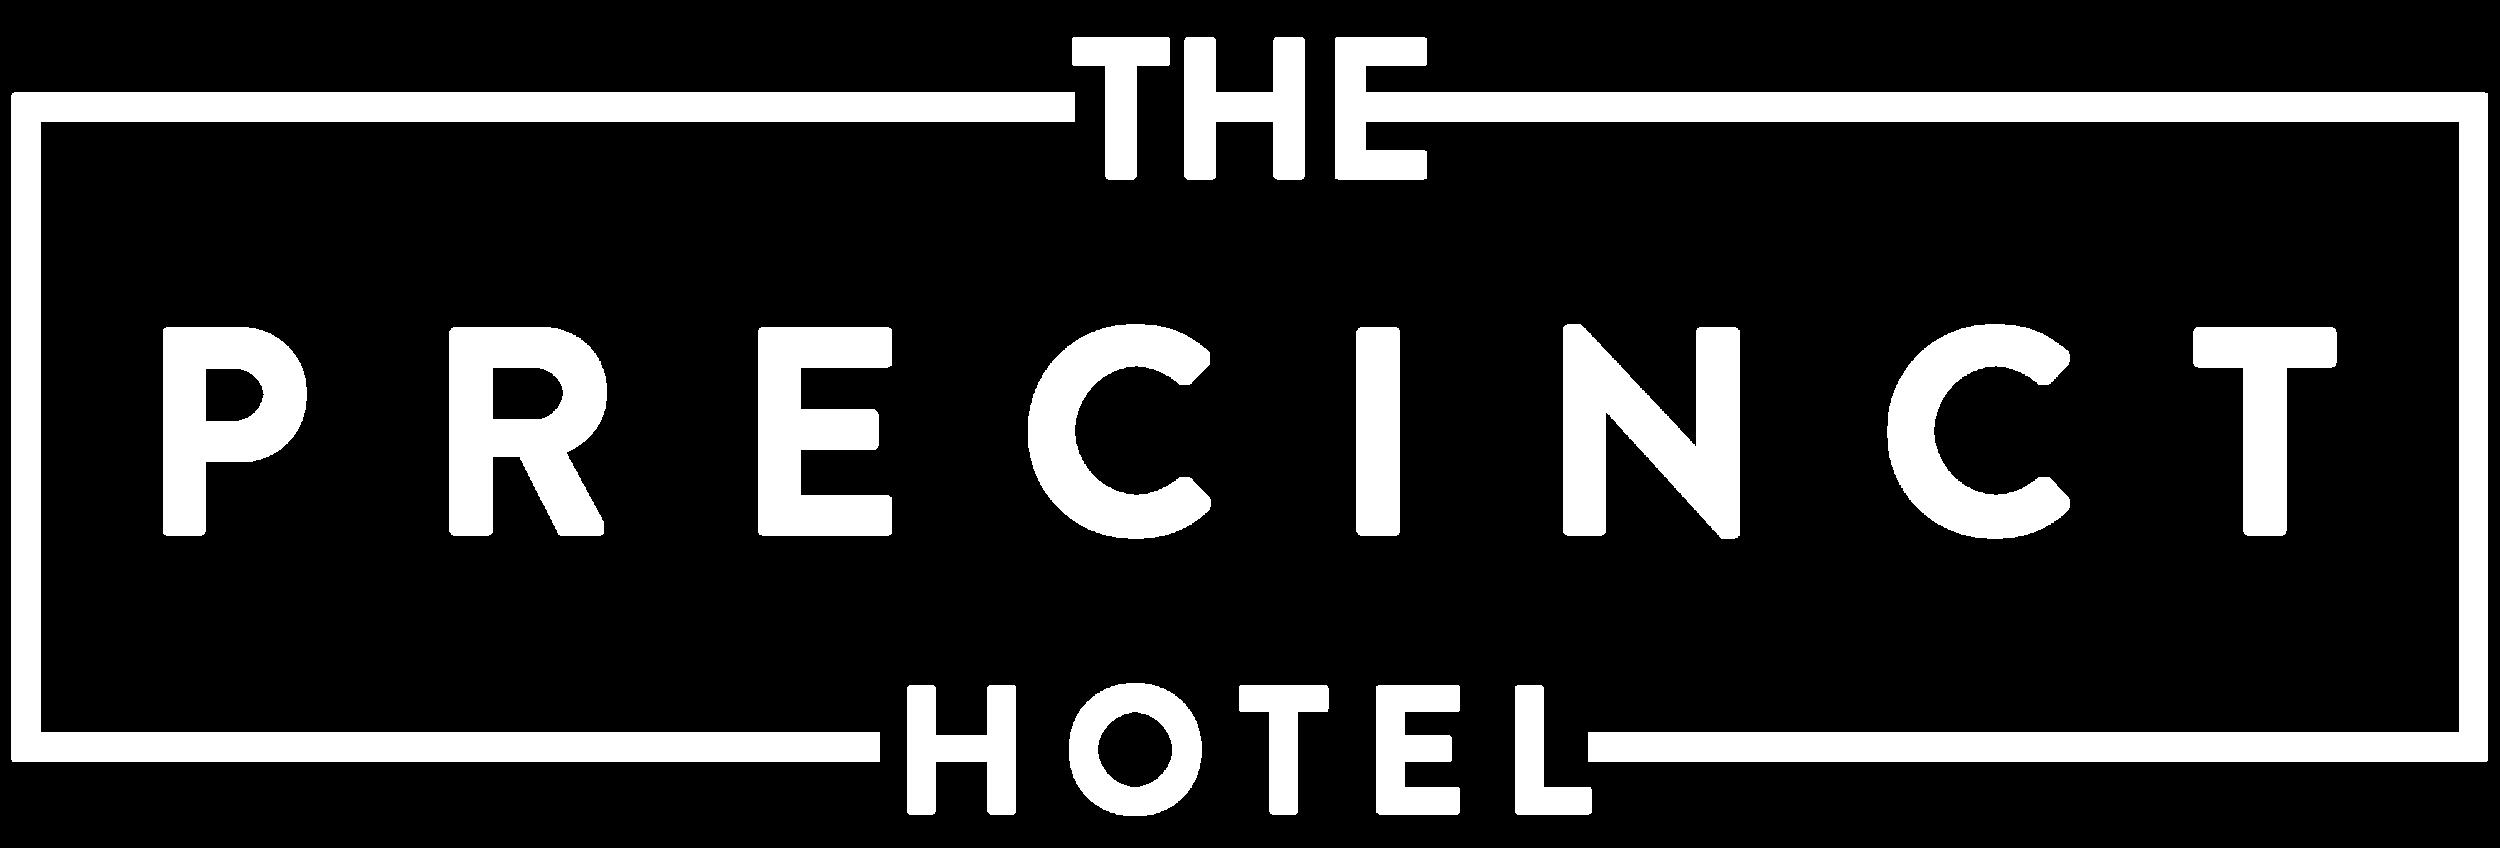 The Precinct Hotel